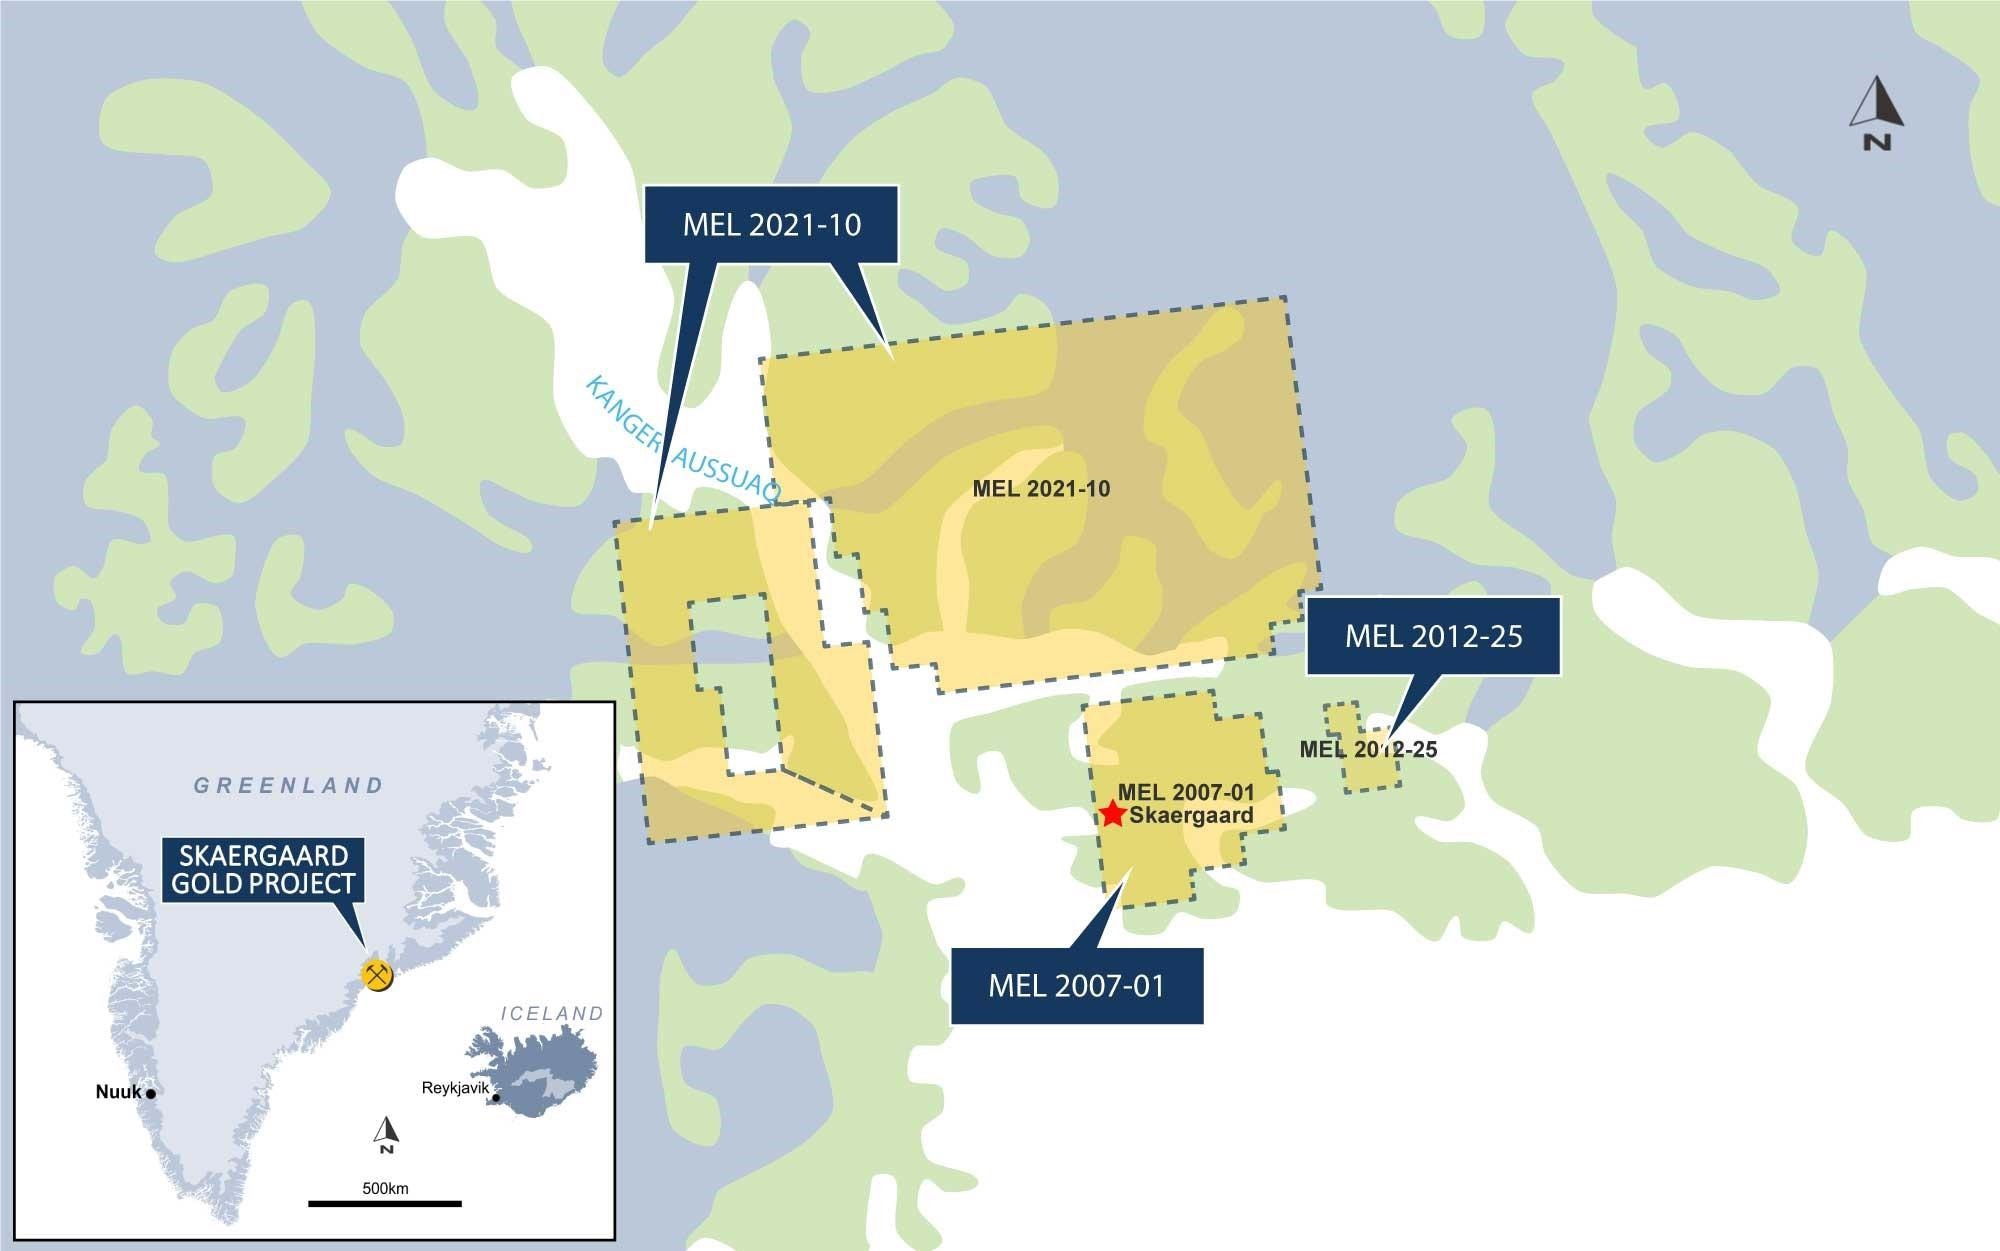 Major Precious Metals Reports Exploration, Drilling Plans for Skaergaard Project